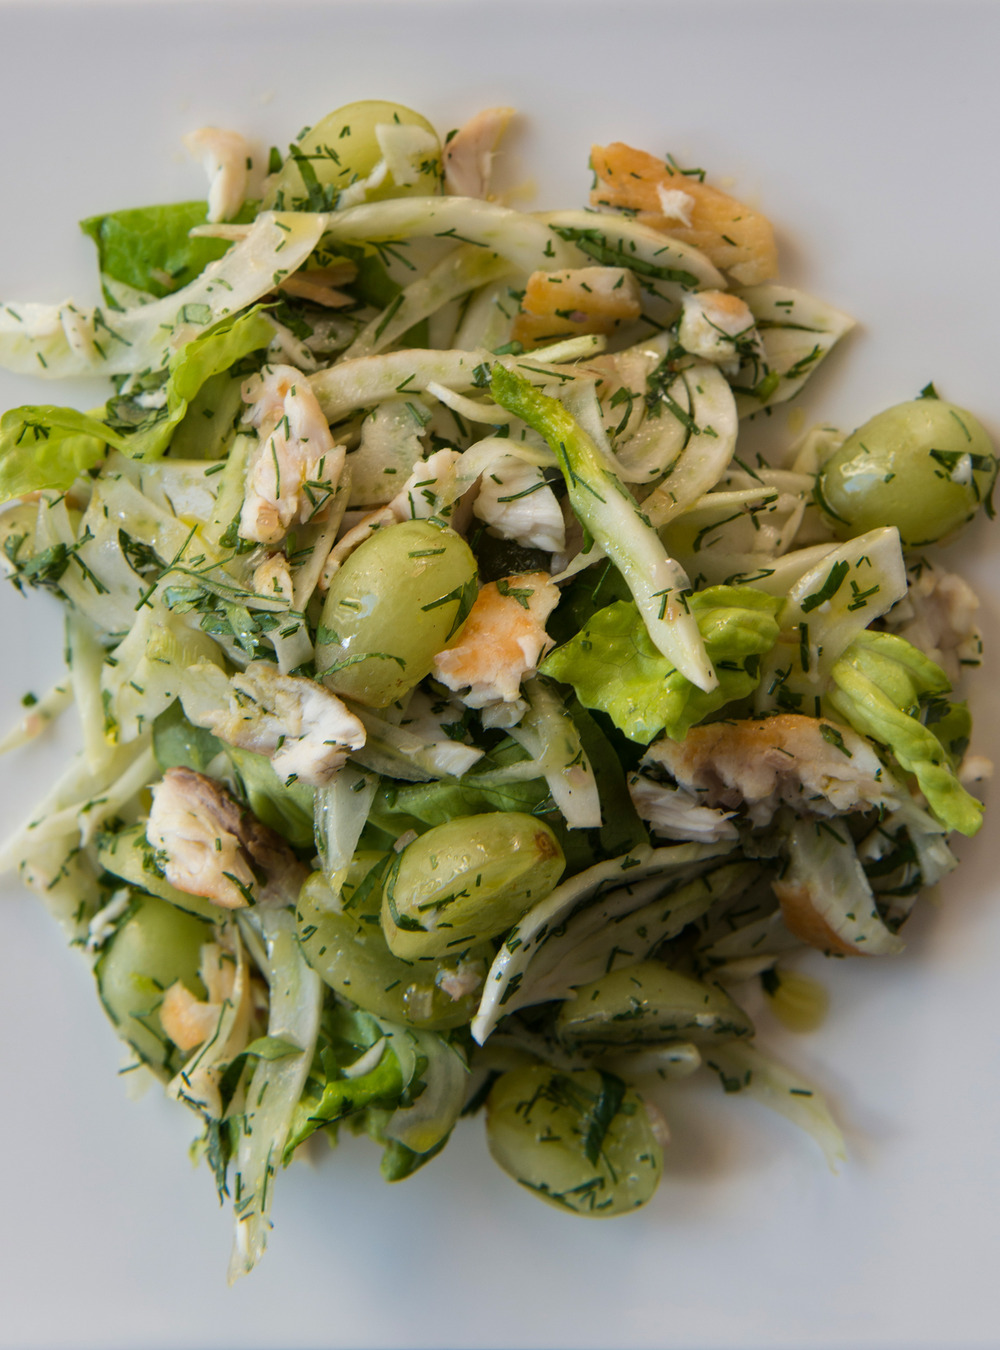 Salade tiède de fenouil, de raisins et de poisson | ricardo